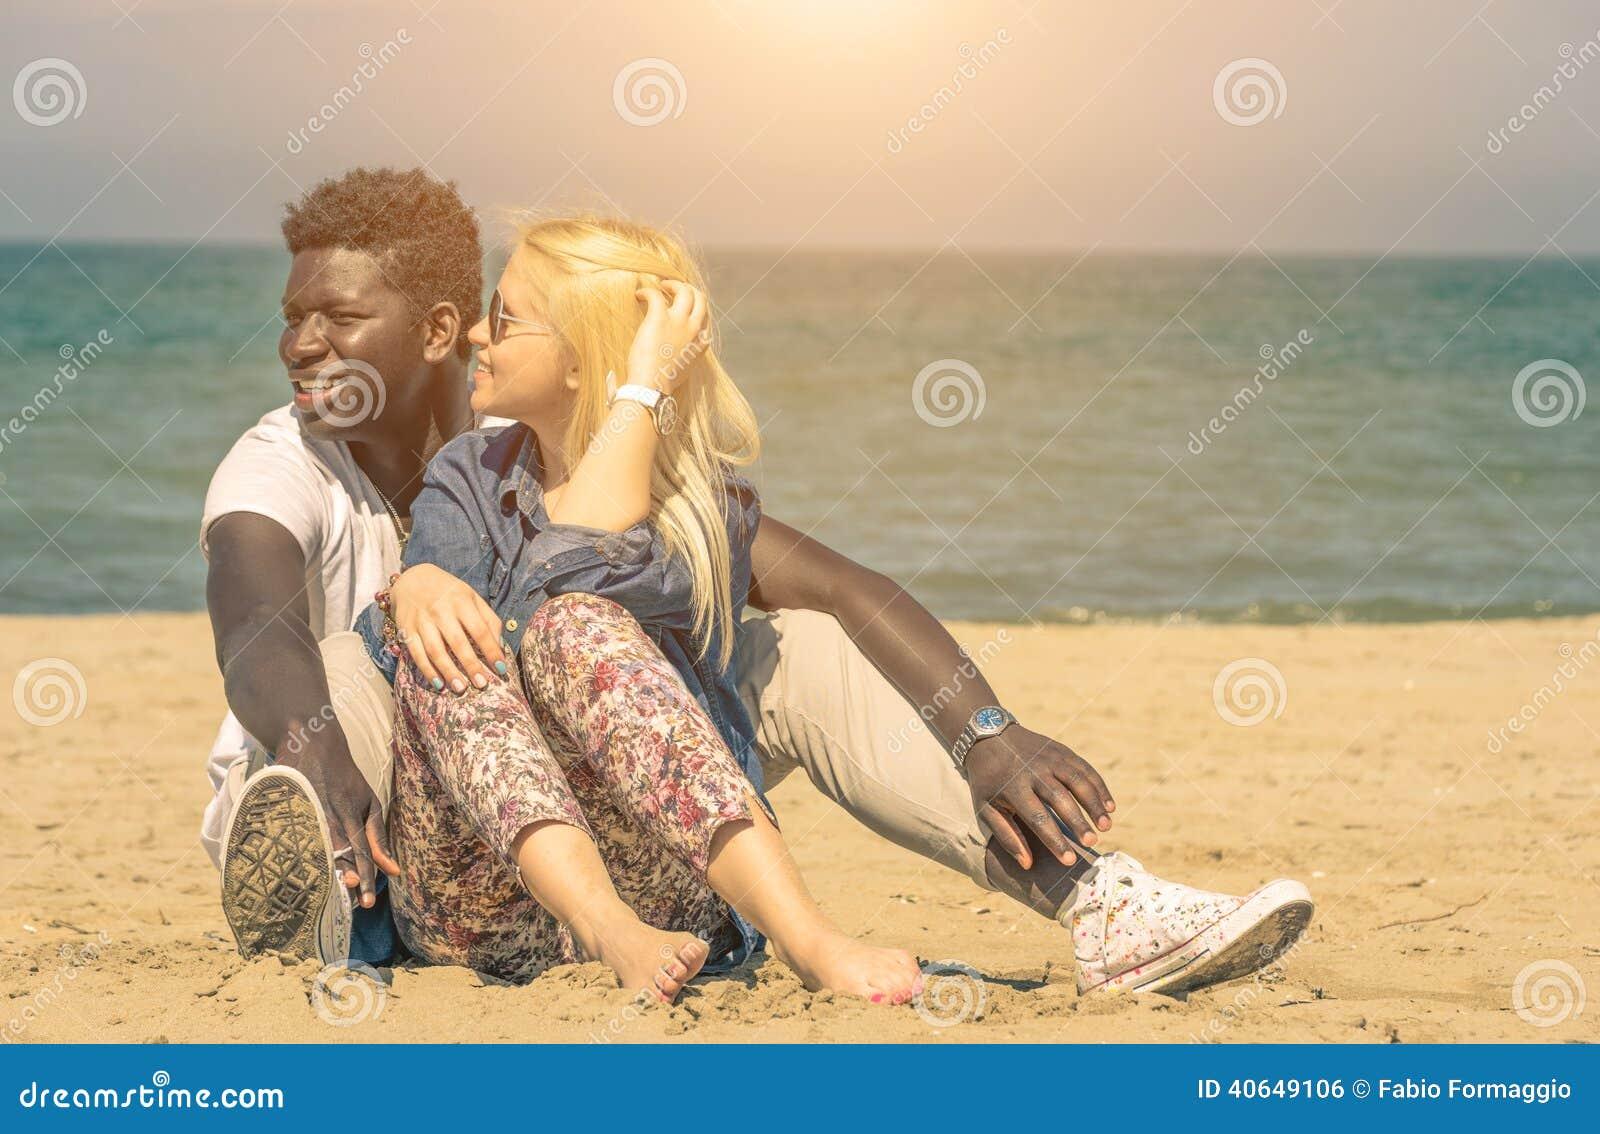 Interracial dating kaart